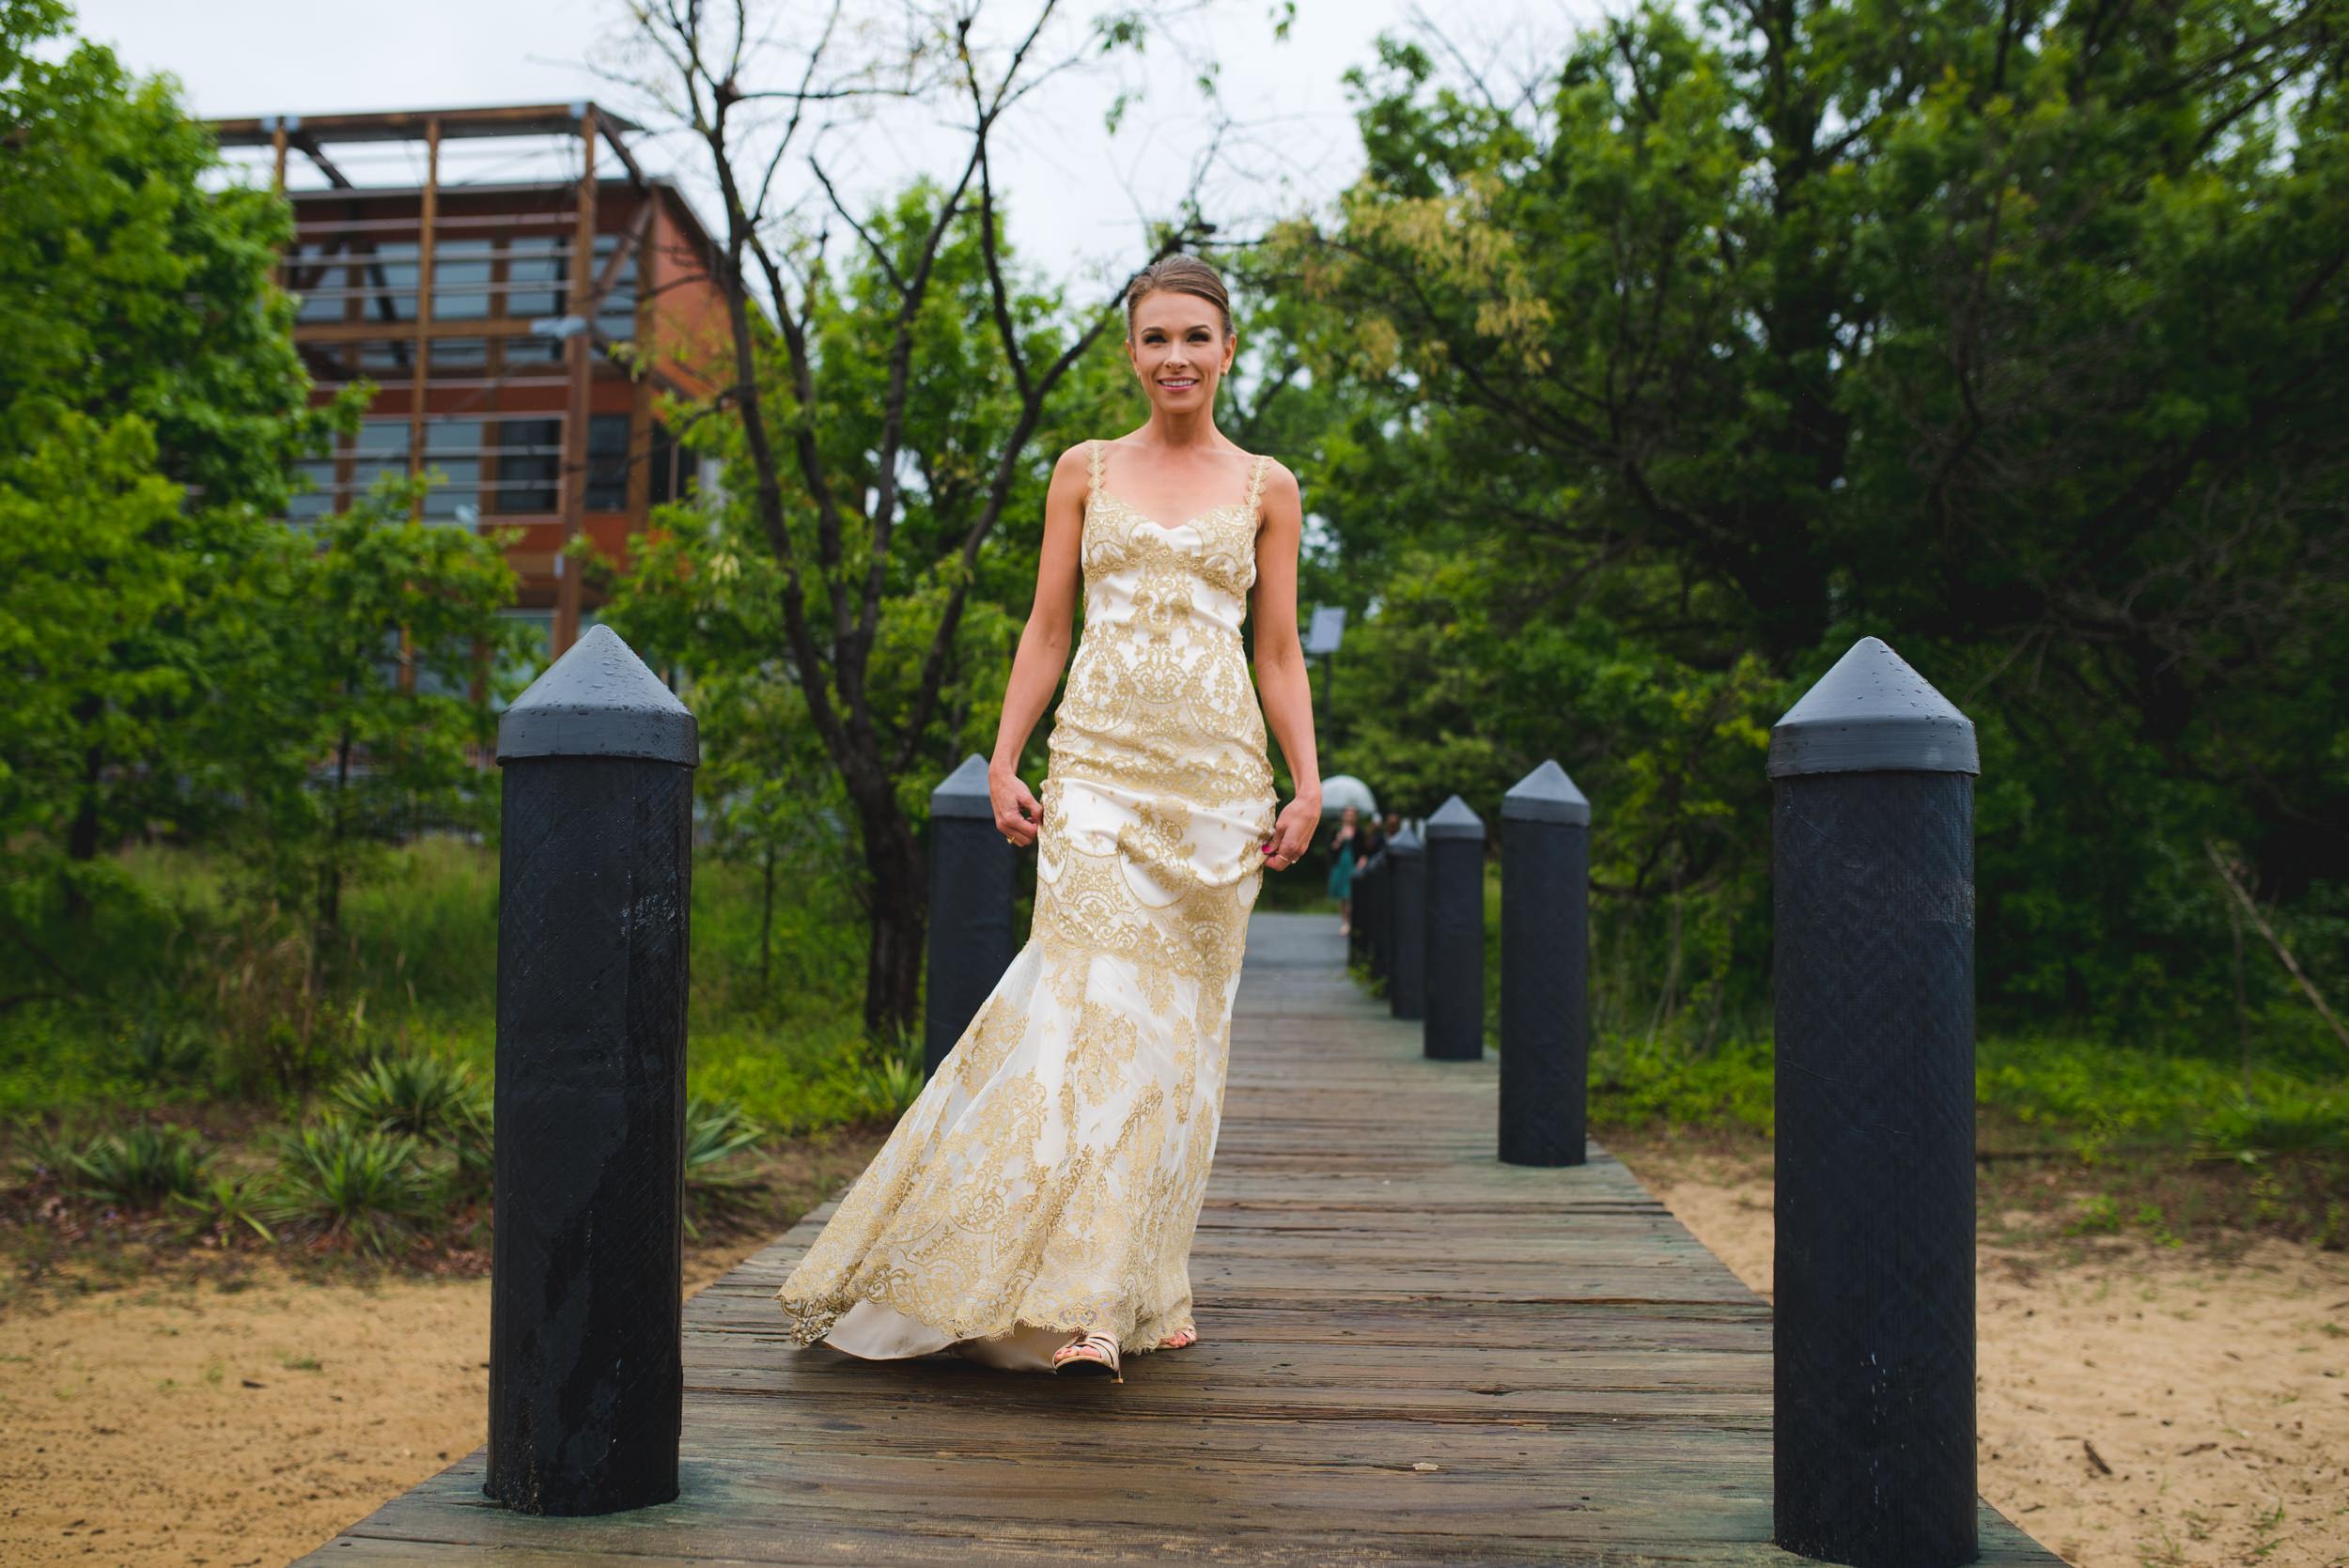 Philip Merrill Environmental Center wedding-8.jpg